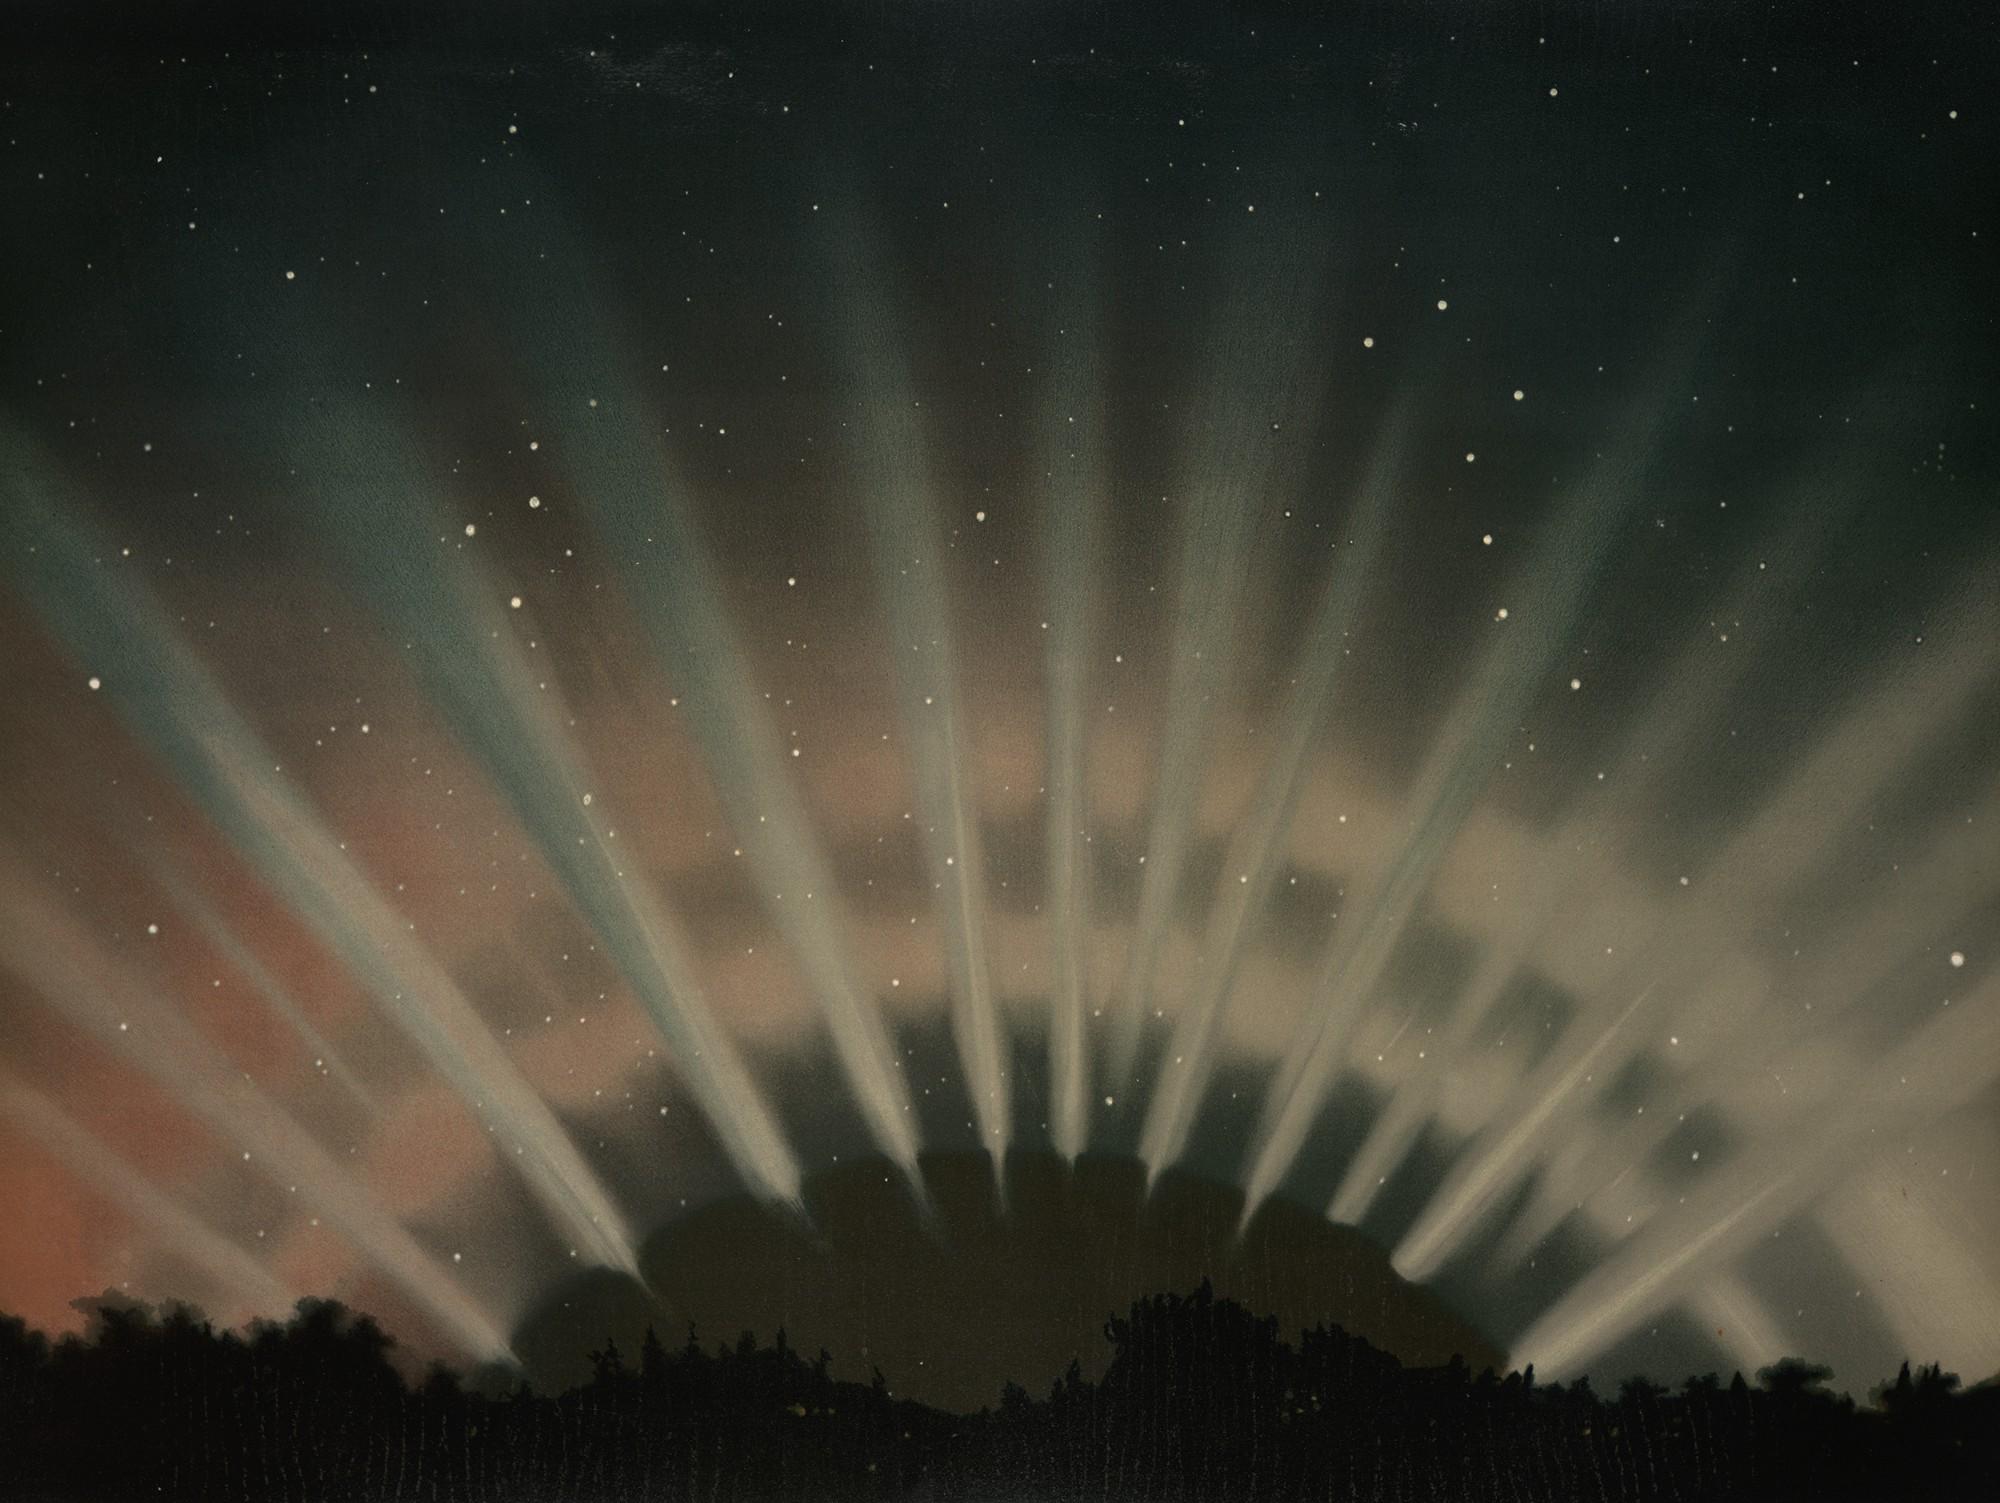 Aurora Borealis by E.Trouvelot, 1872